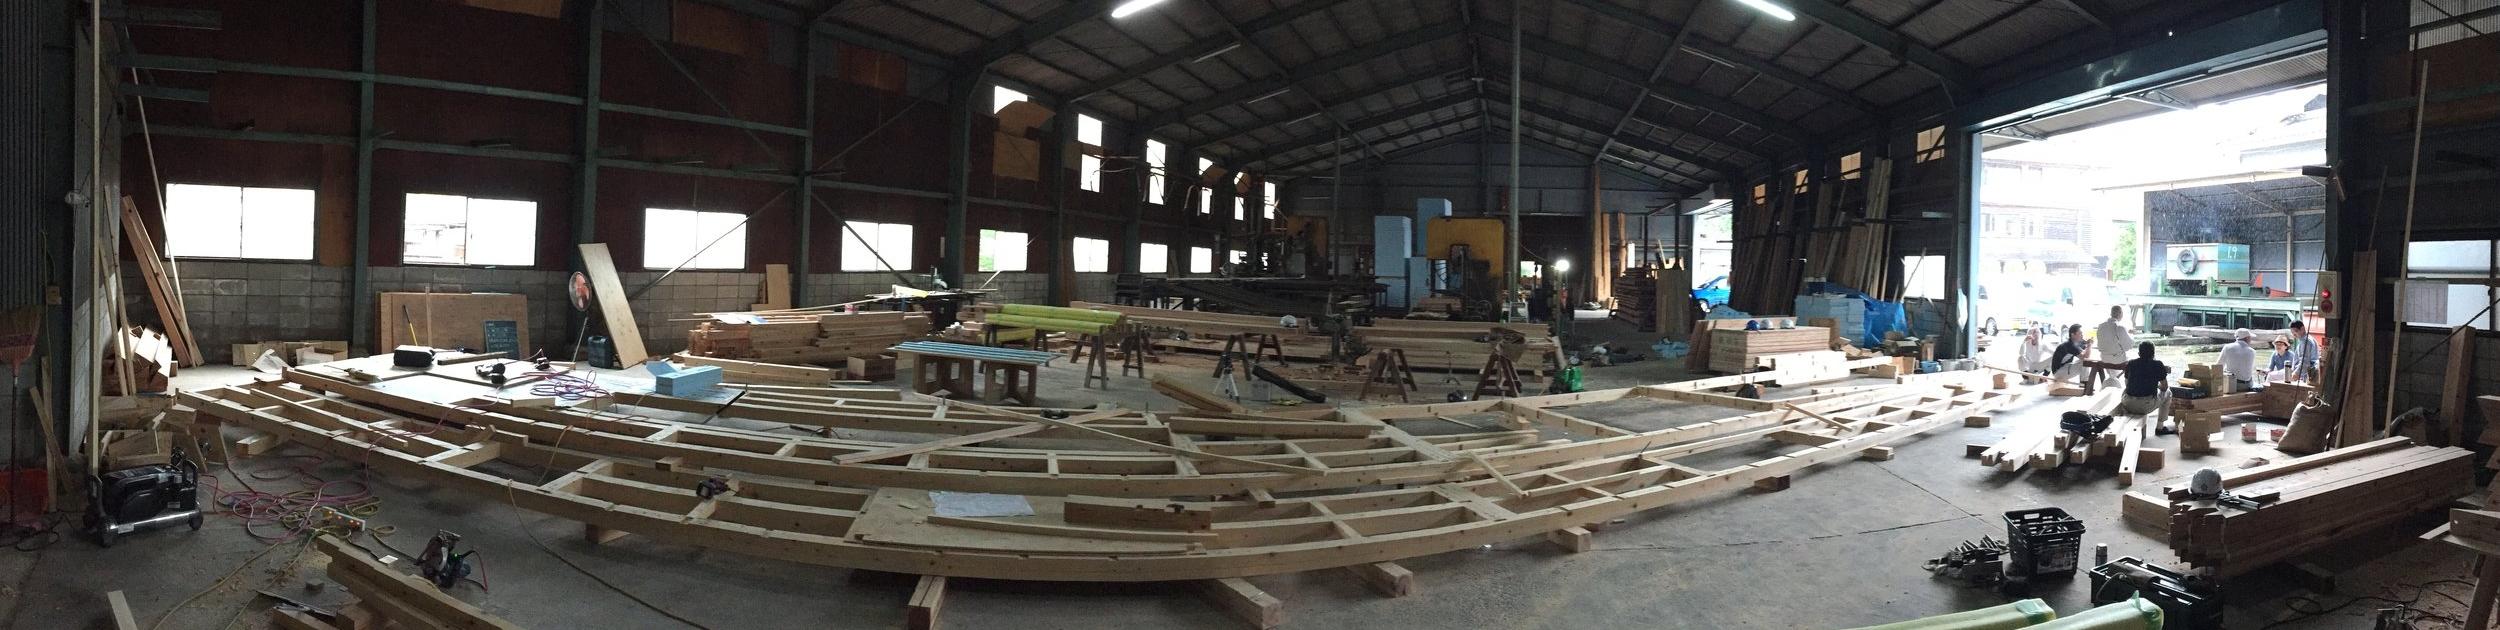 construction4.jpeg